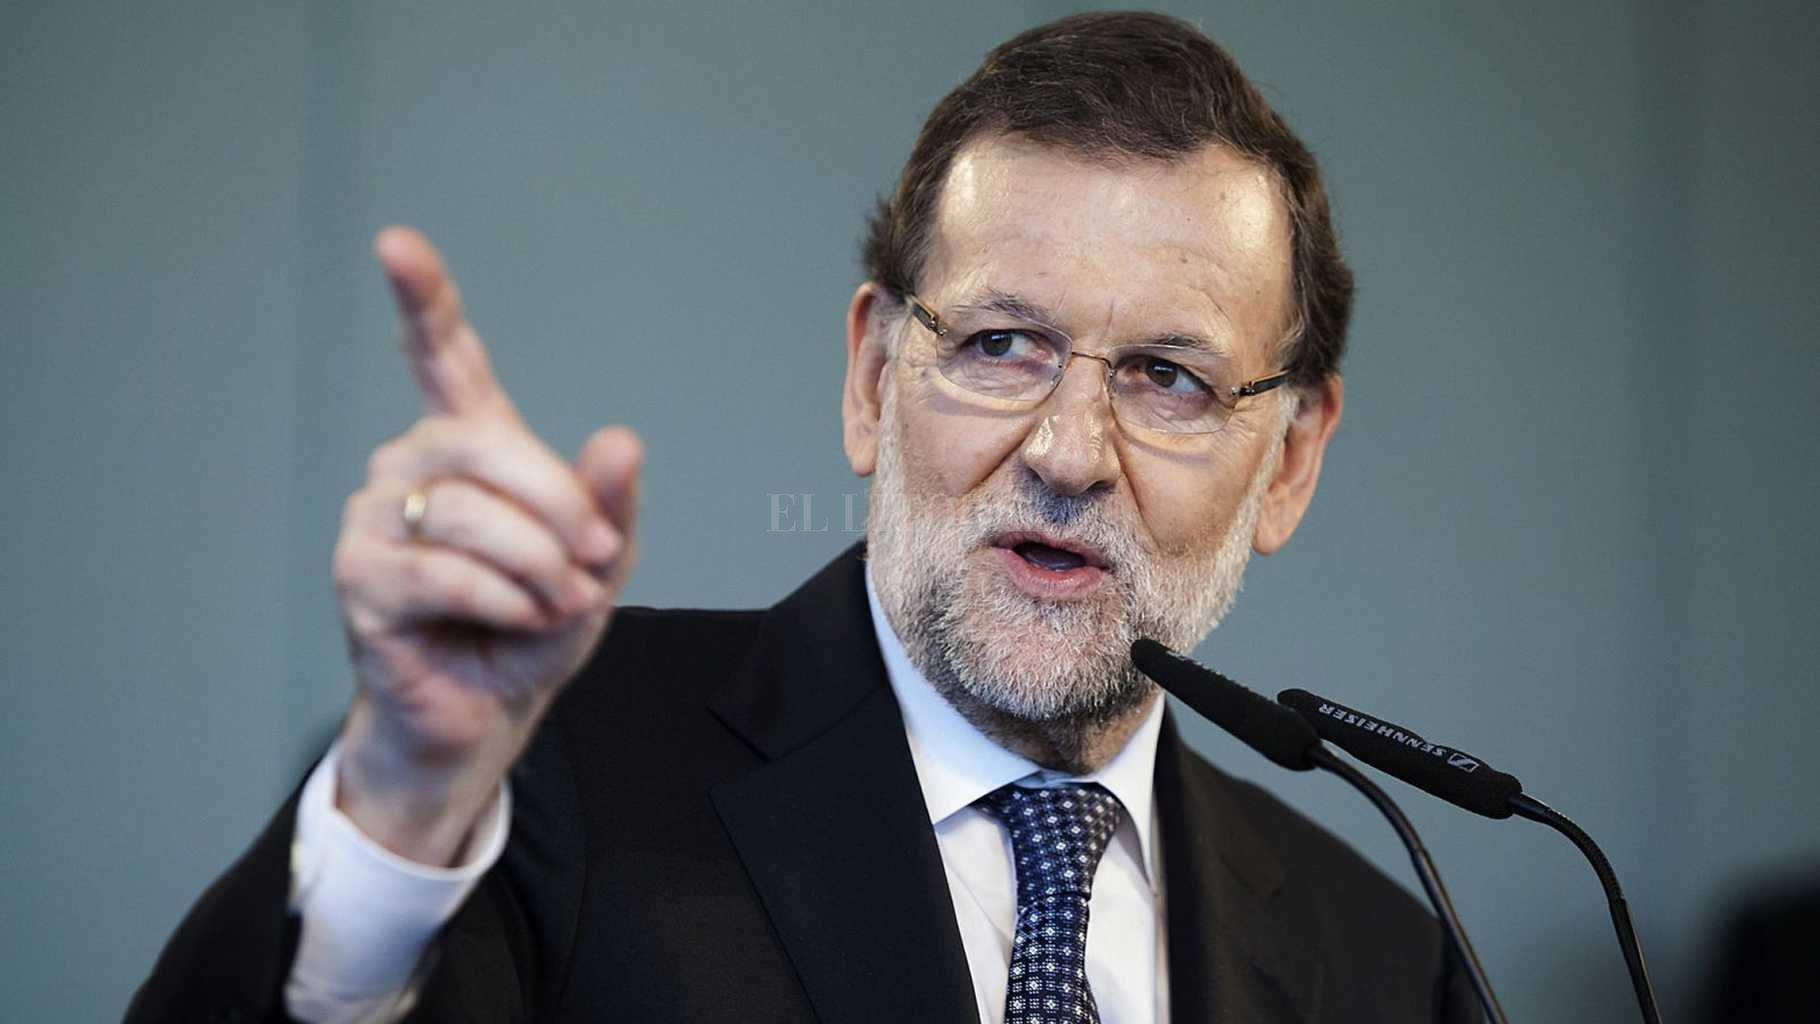 Rajoy convocado a declarar por sobornos